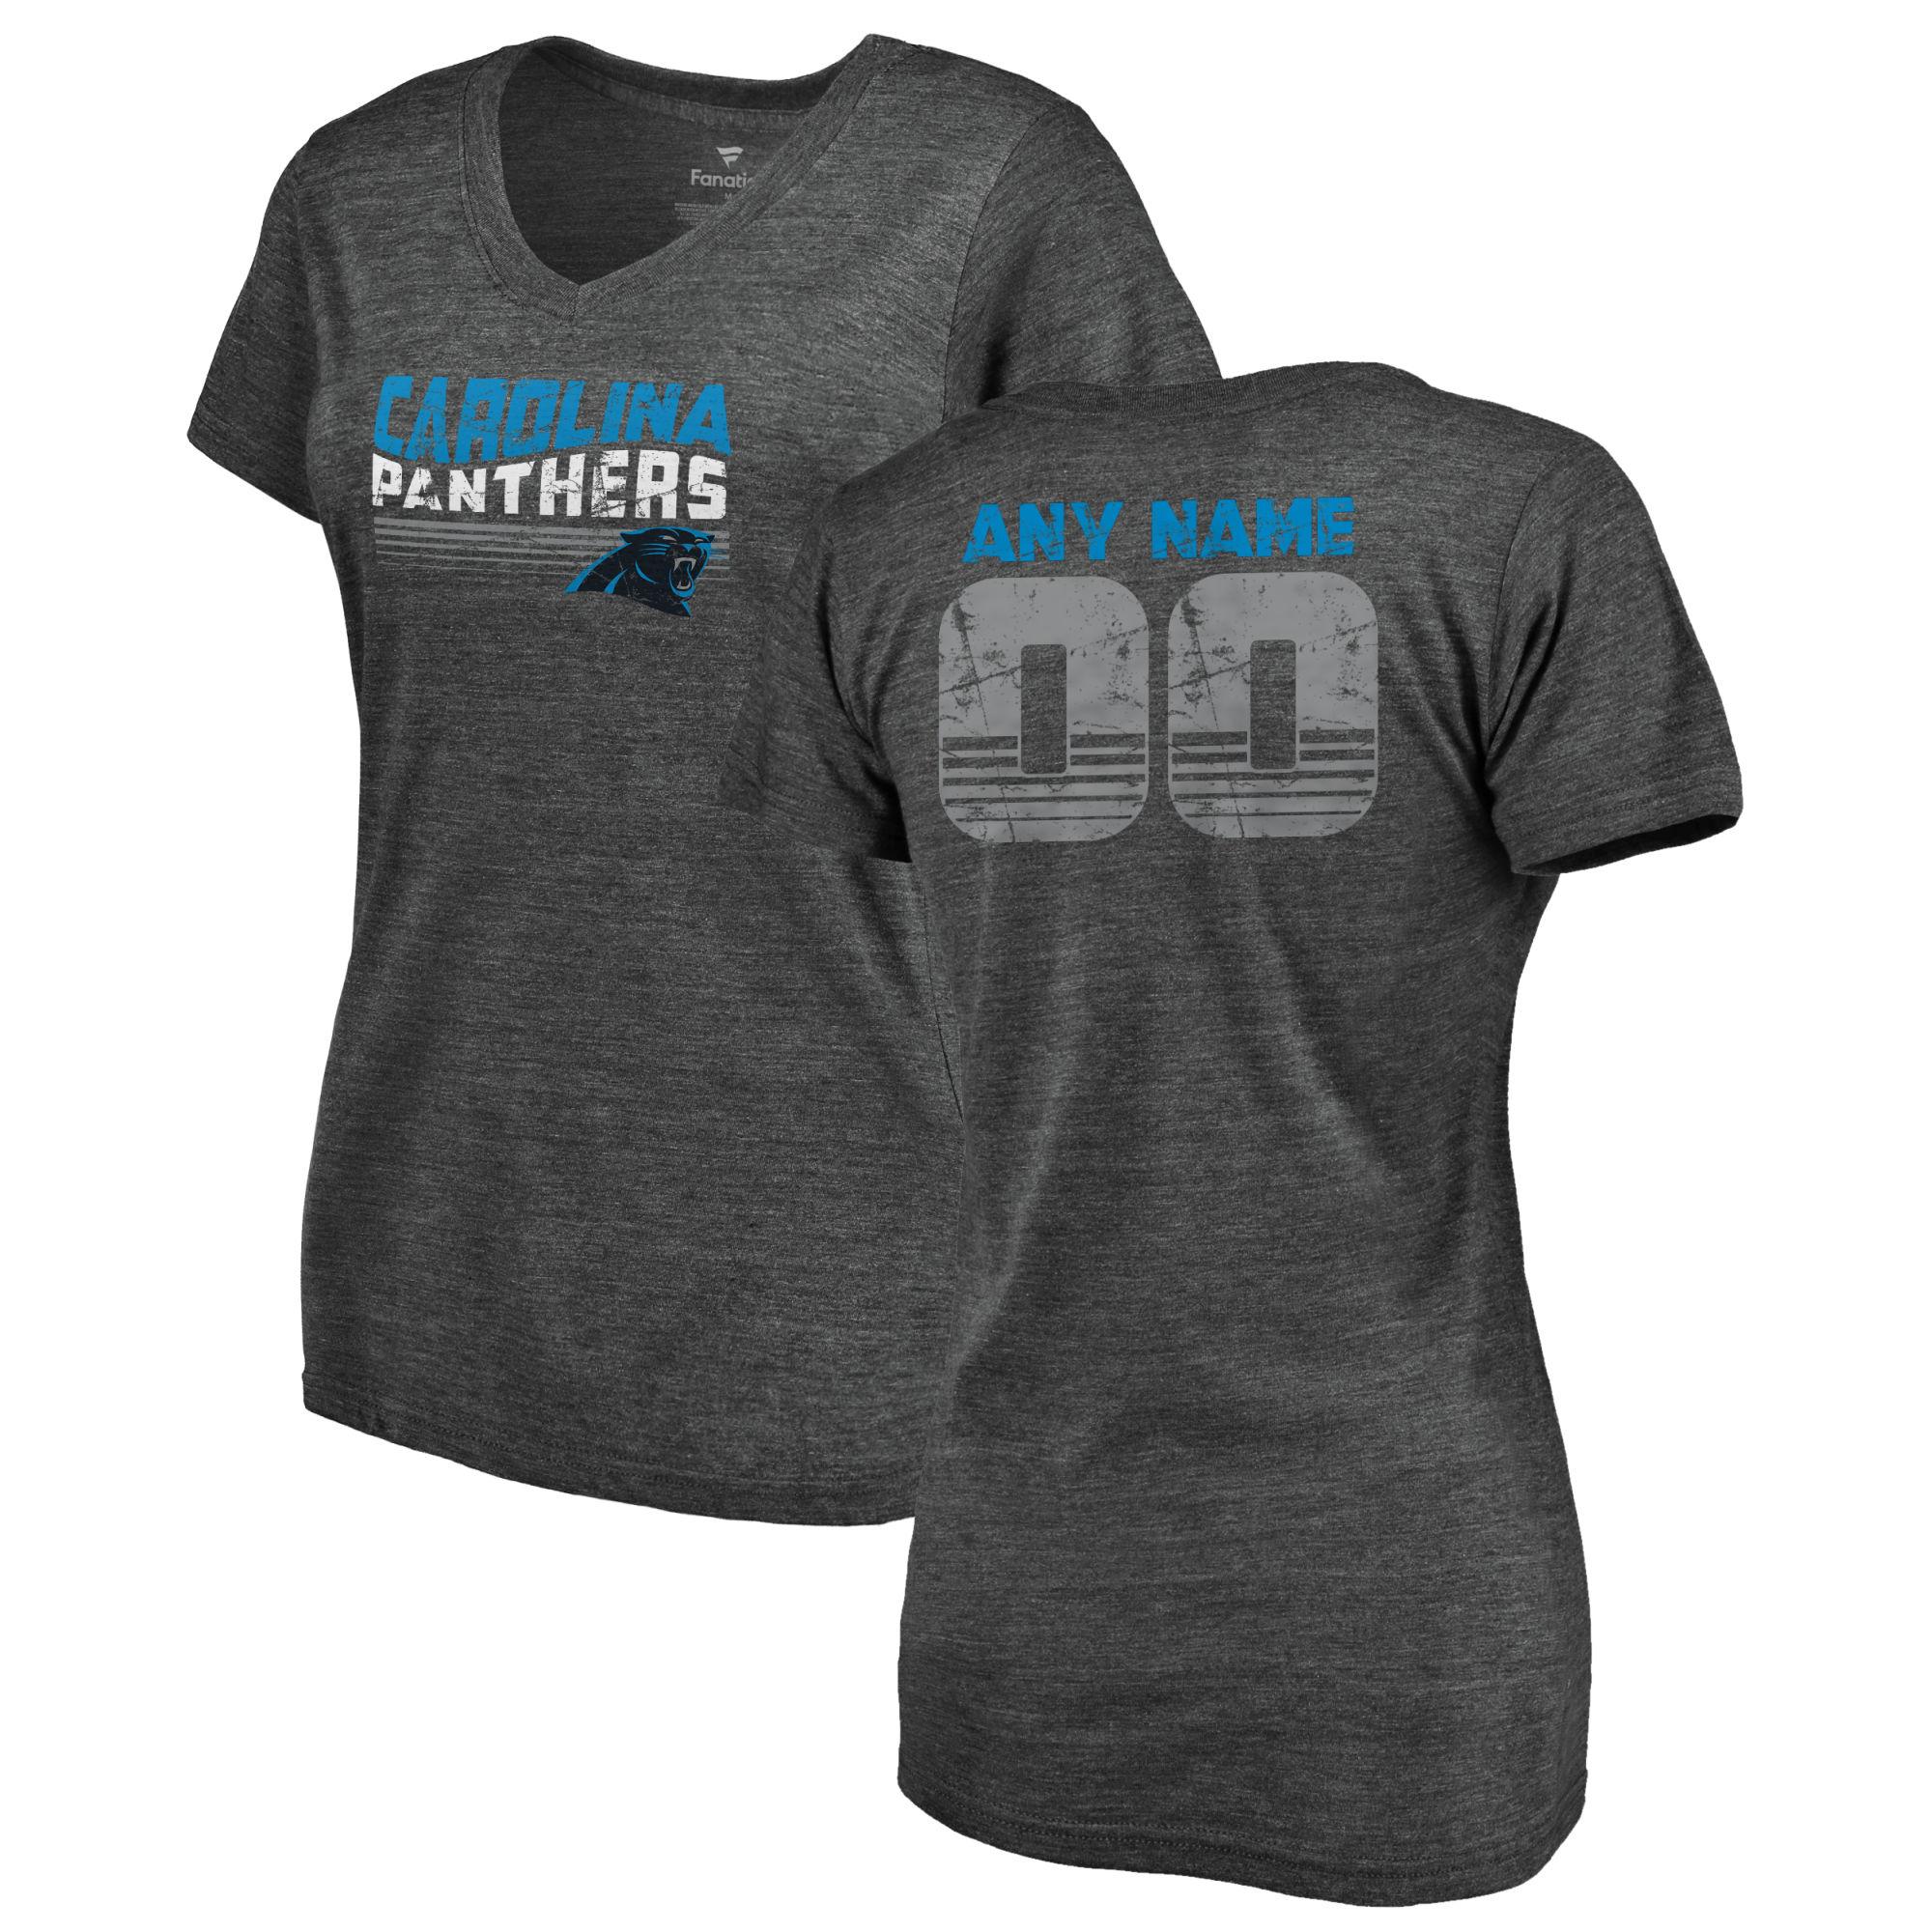 Carolina Panthers NFL Pro Line by Fanatics Branded Women's Personalized Retro Tri-Blend V-Neck T-Shirt - Black